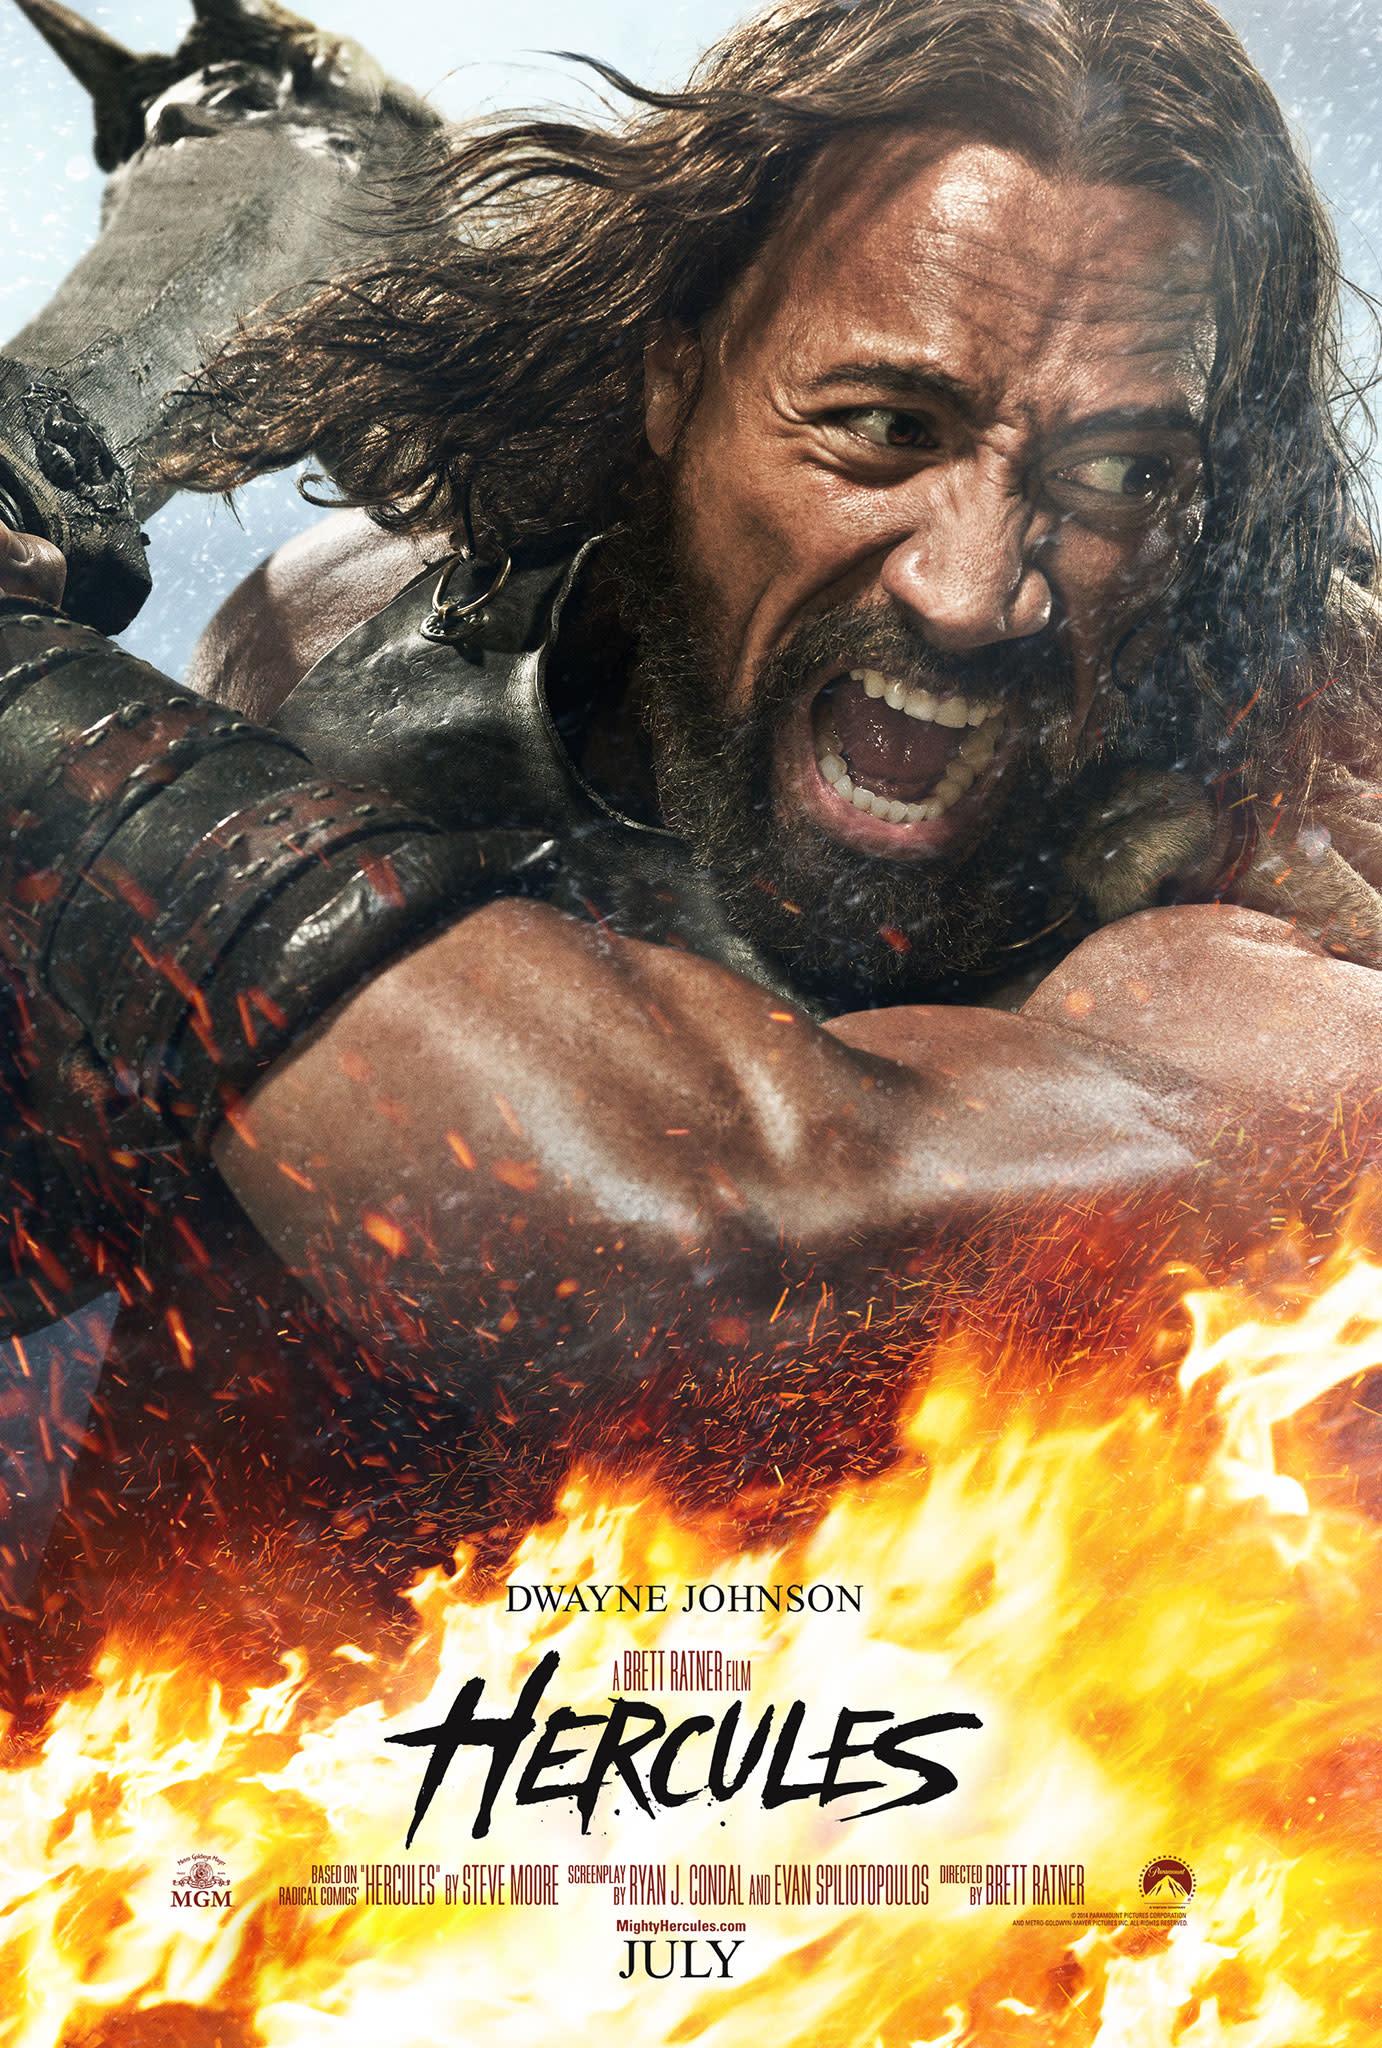 Dwayne Johnson Proves He IS \'Hercules\' in First Teaser Trailer